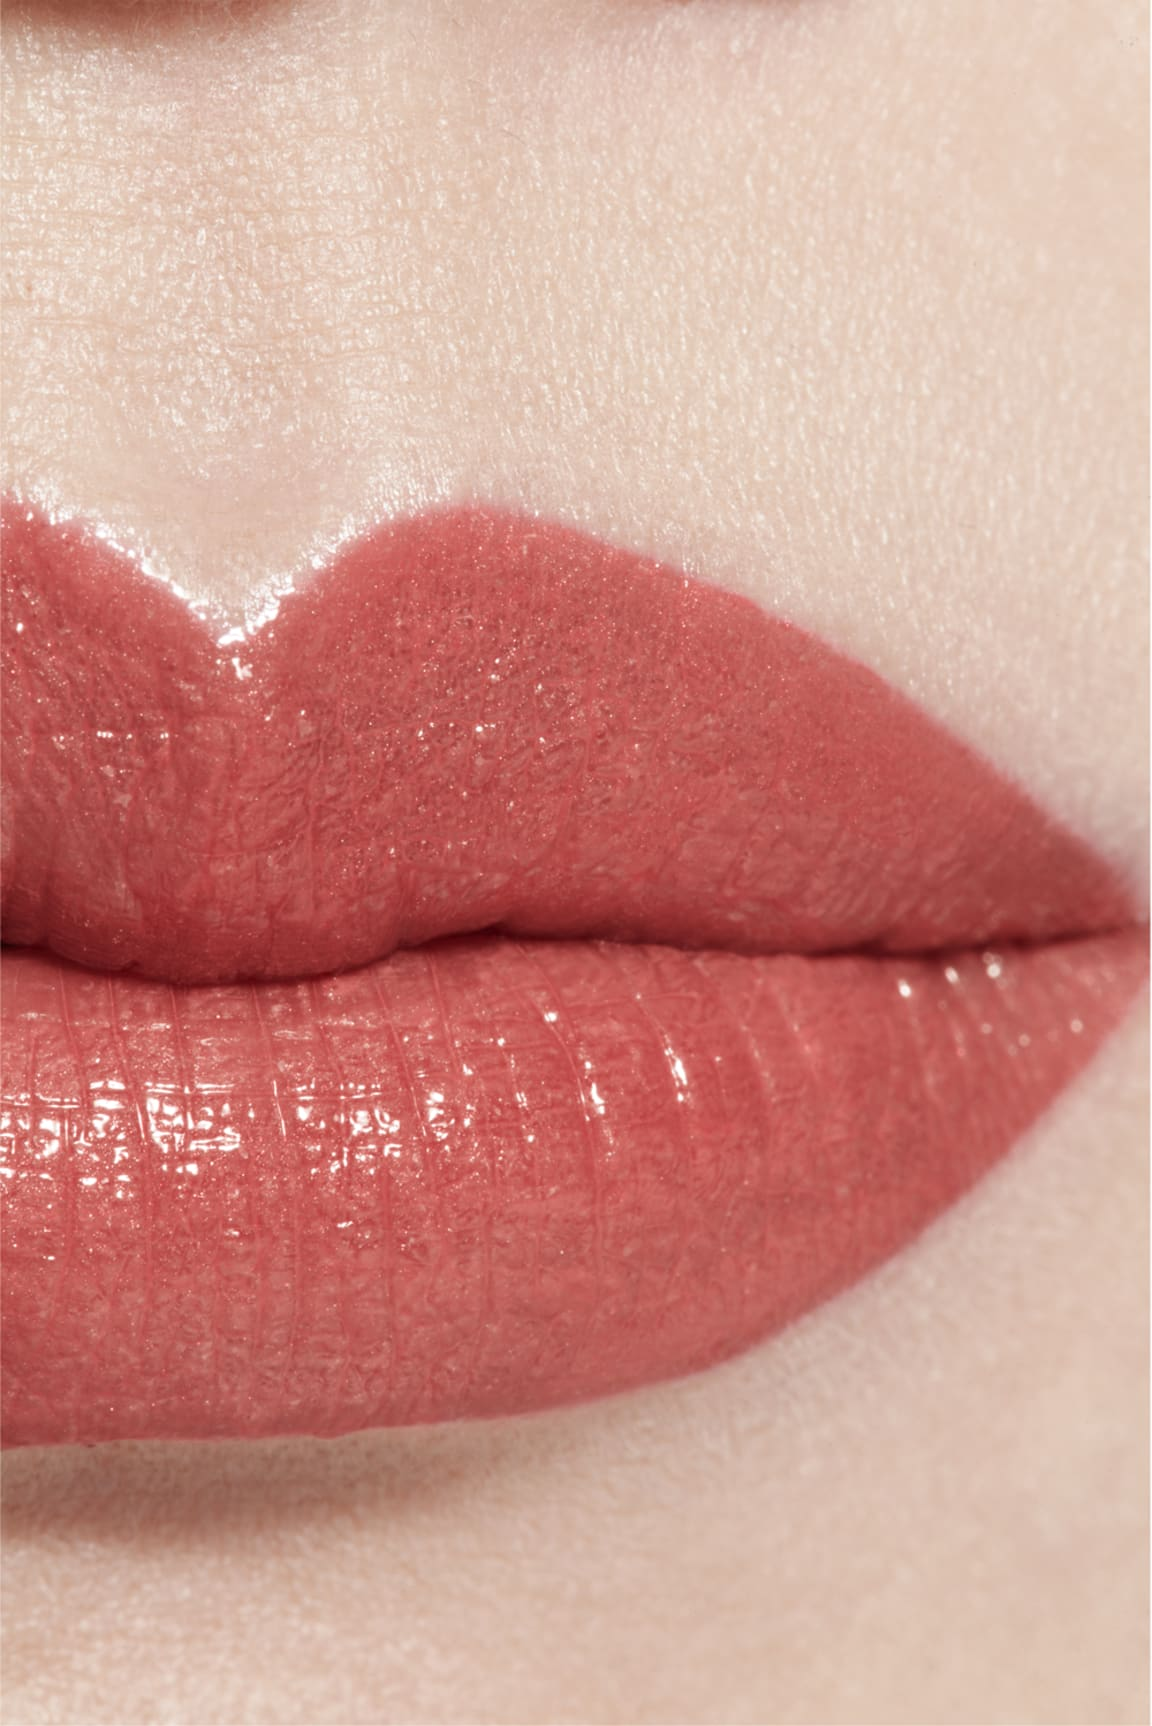 Application makeup visual 1 - ROUGE ALLURE 191 - ROUGE BRÛLANT